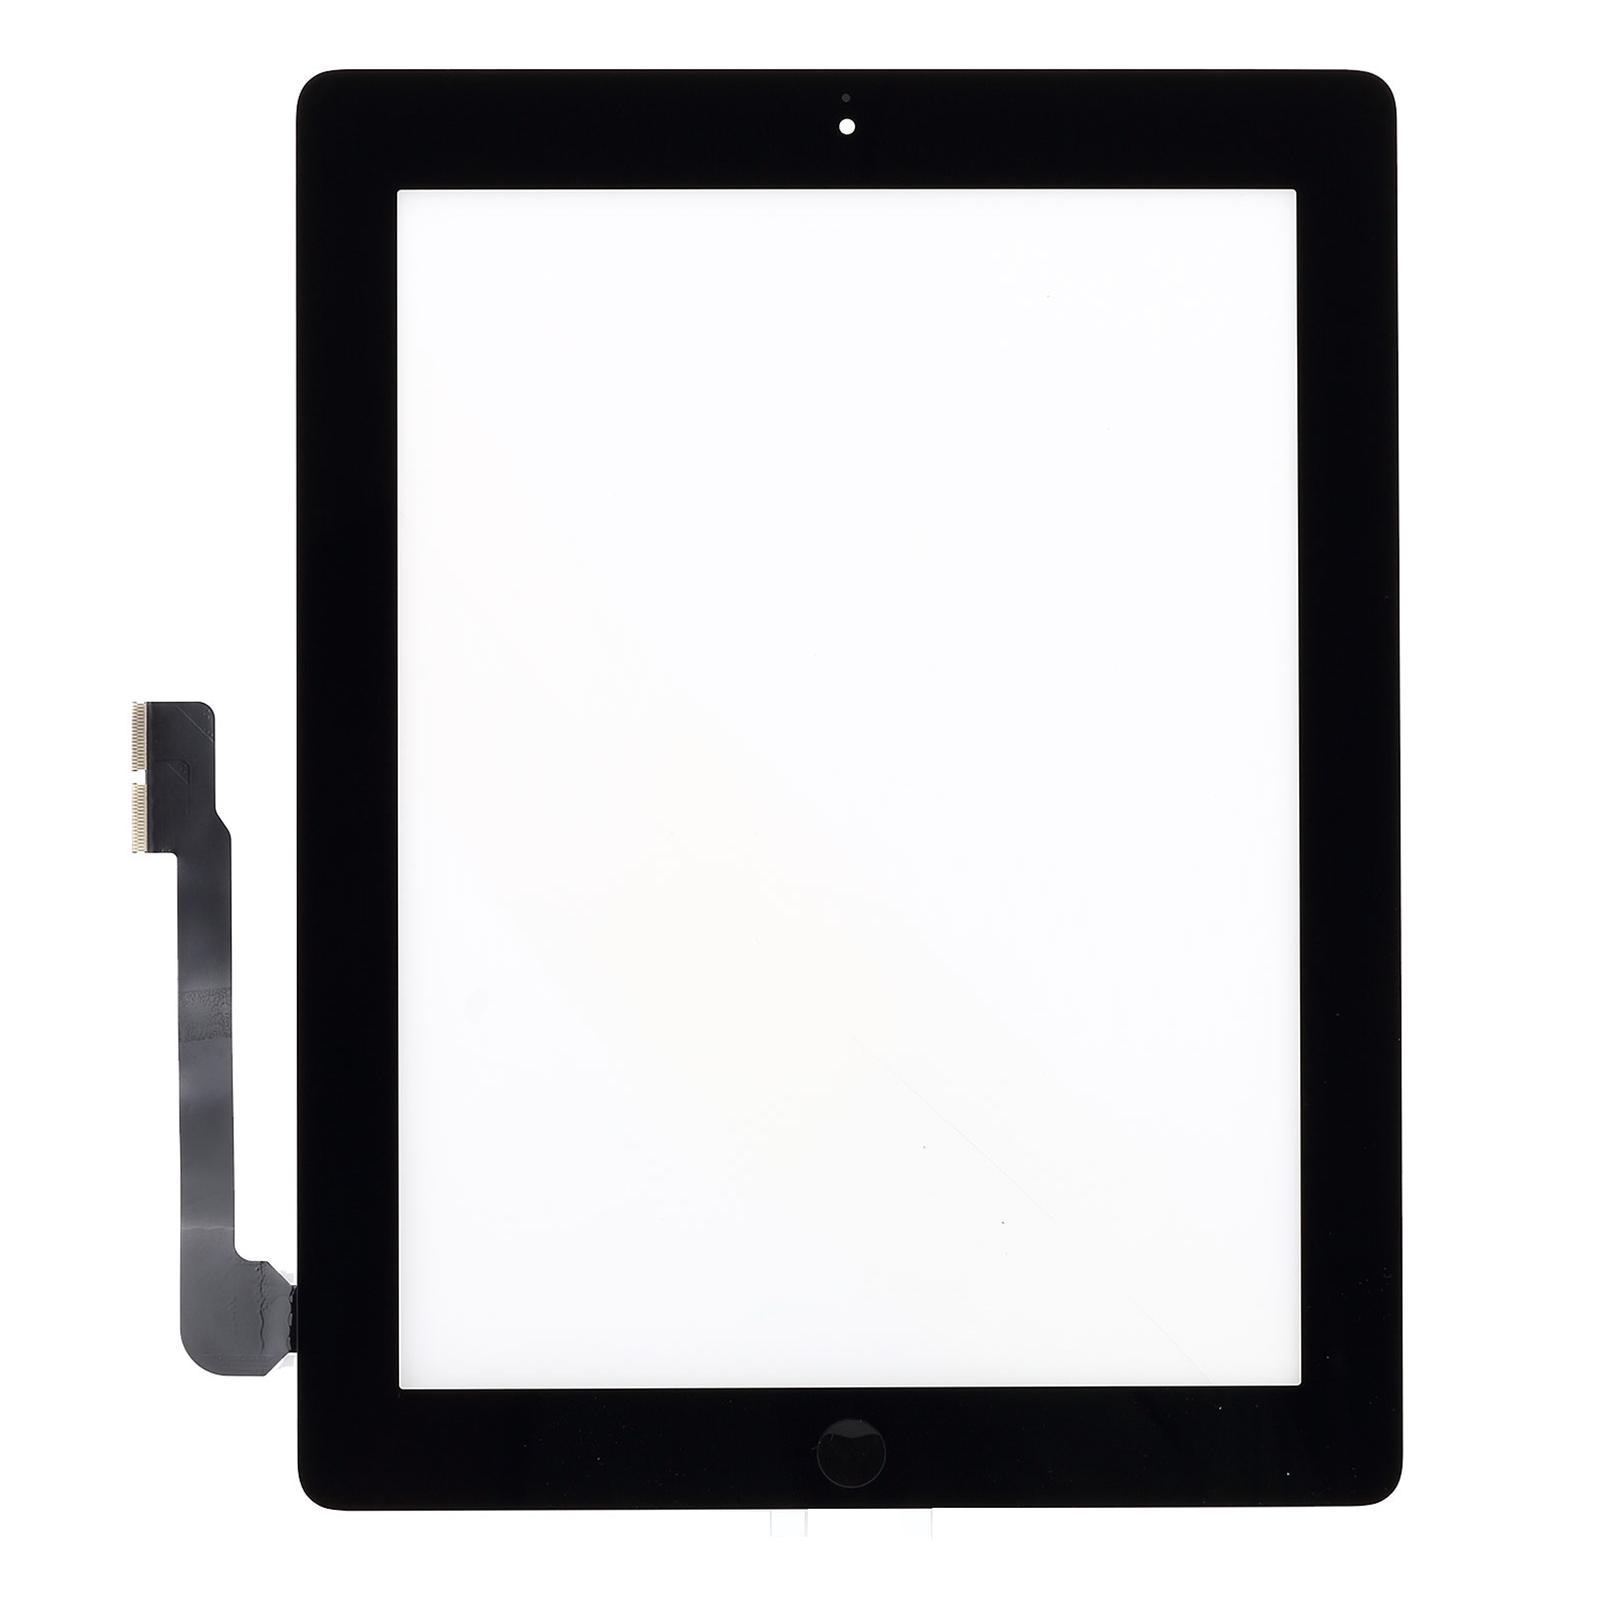 Apple iPad 3 Digitizer Assembly Black